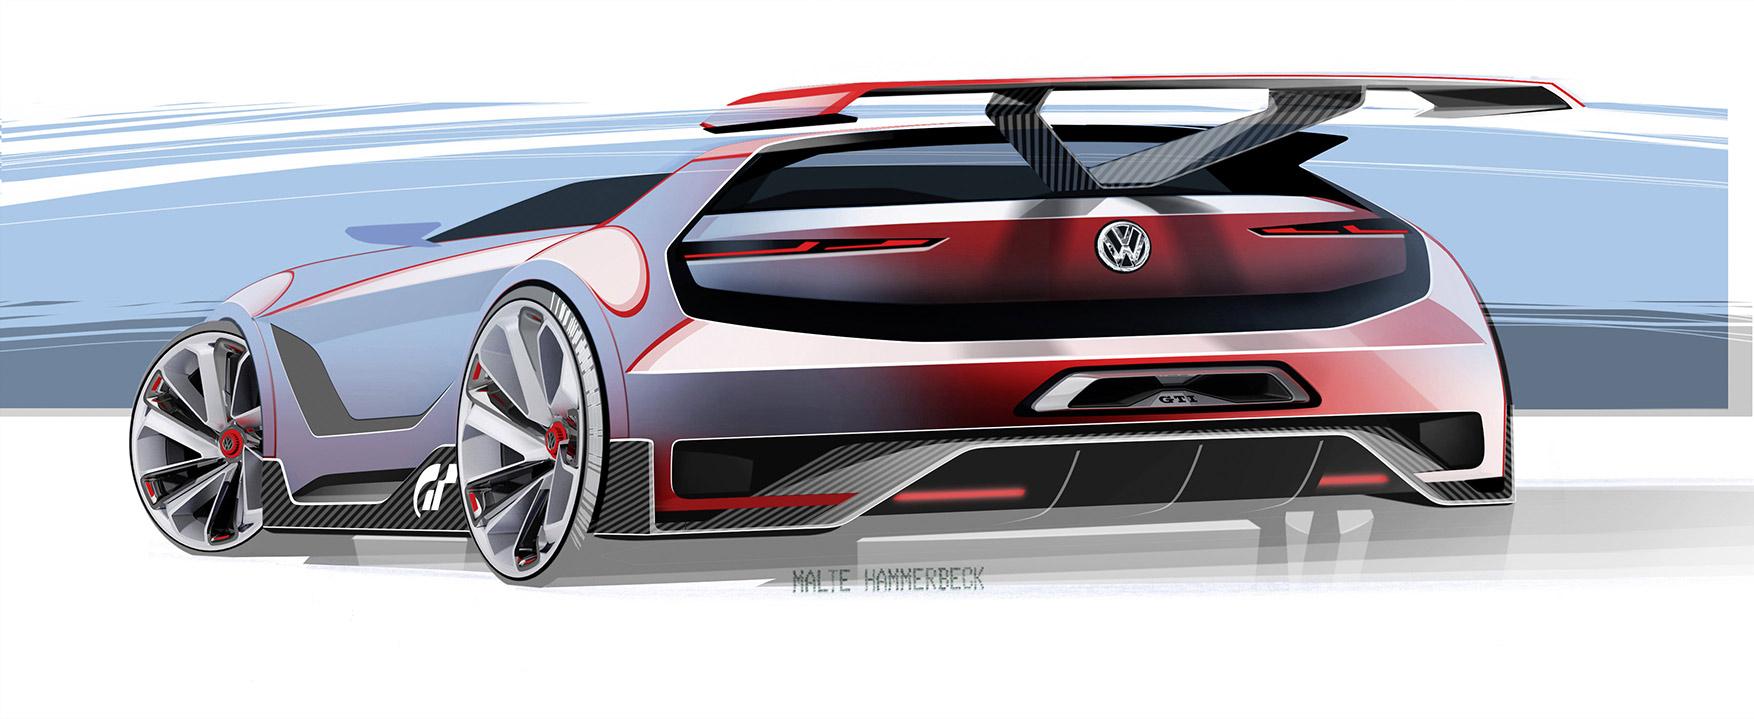 volkswagen-design-vision-gti-gran-turismo-007